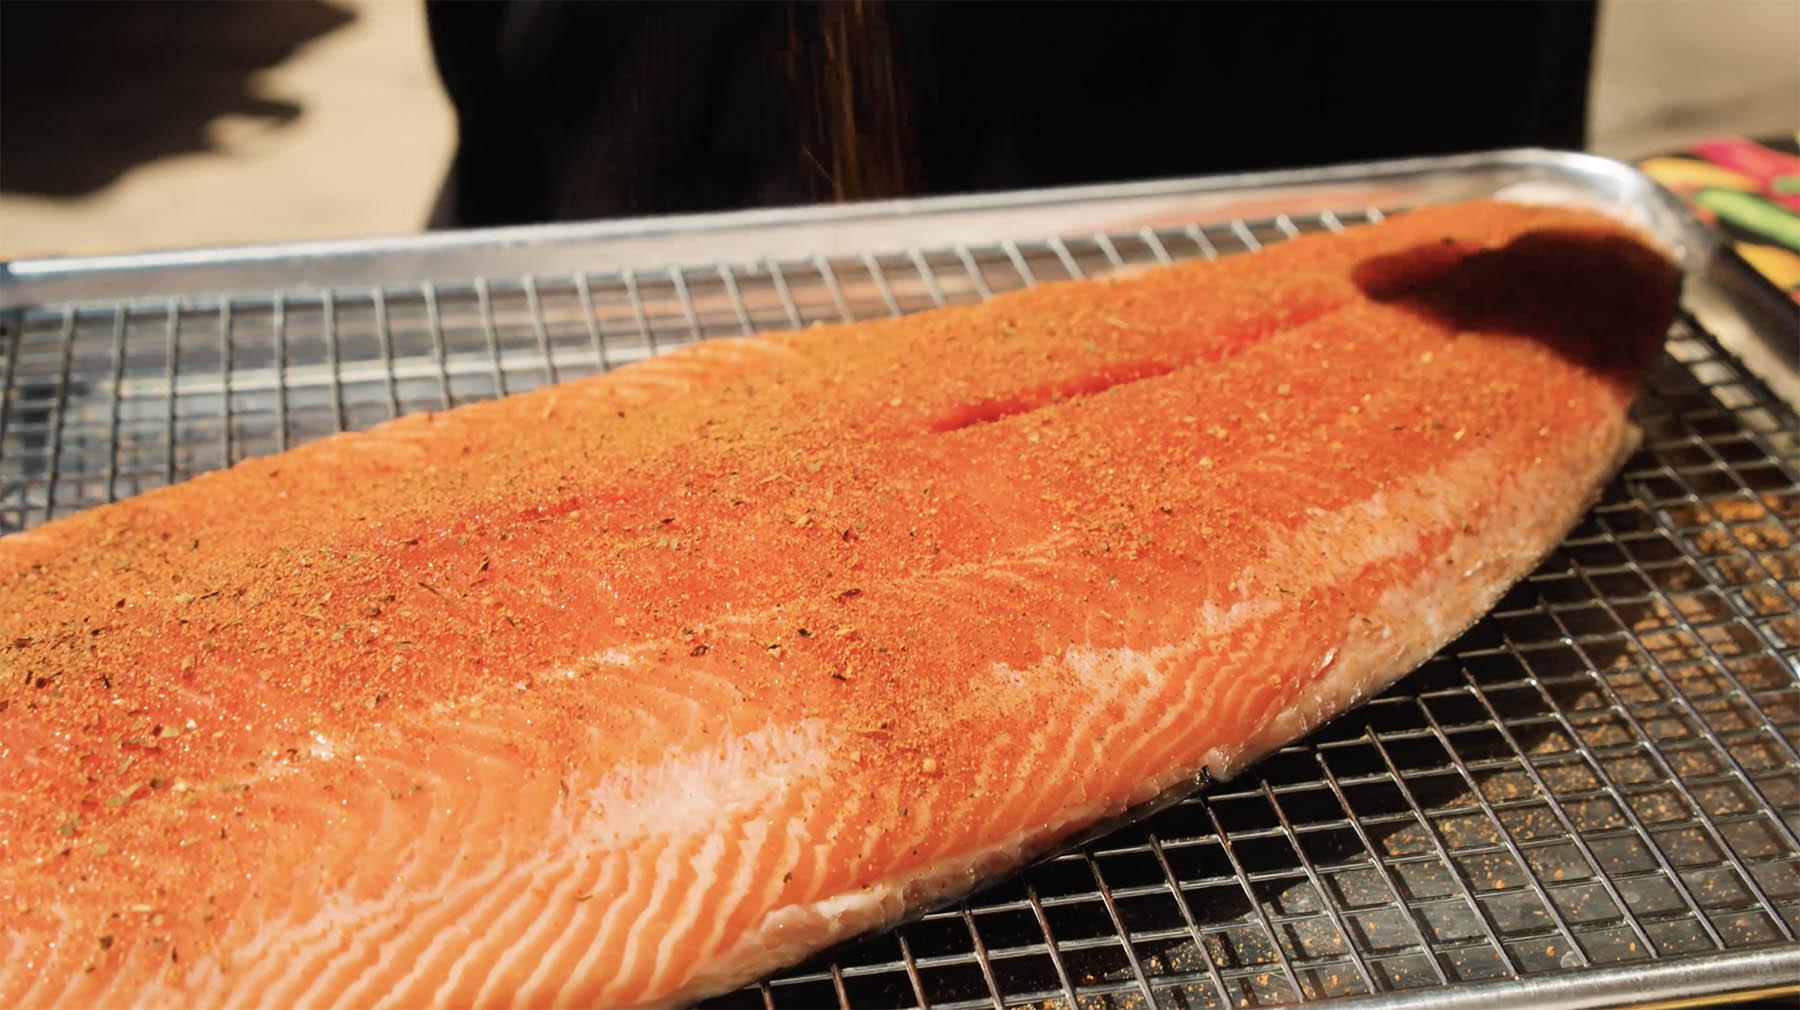 Salmon filet seasoned with Code 3 Sea Dog Rub